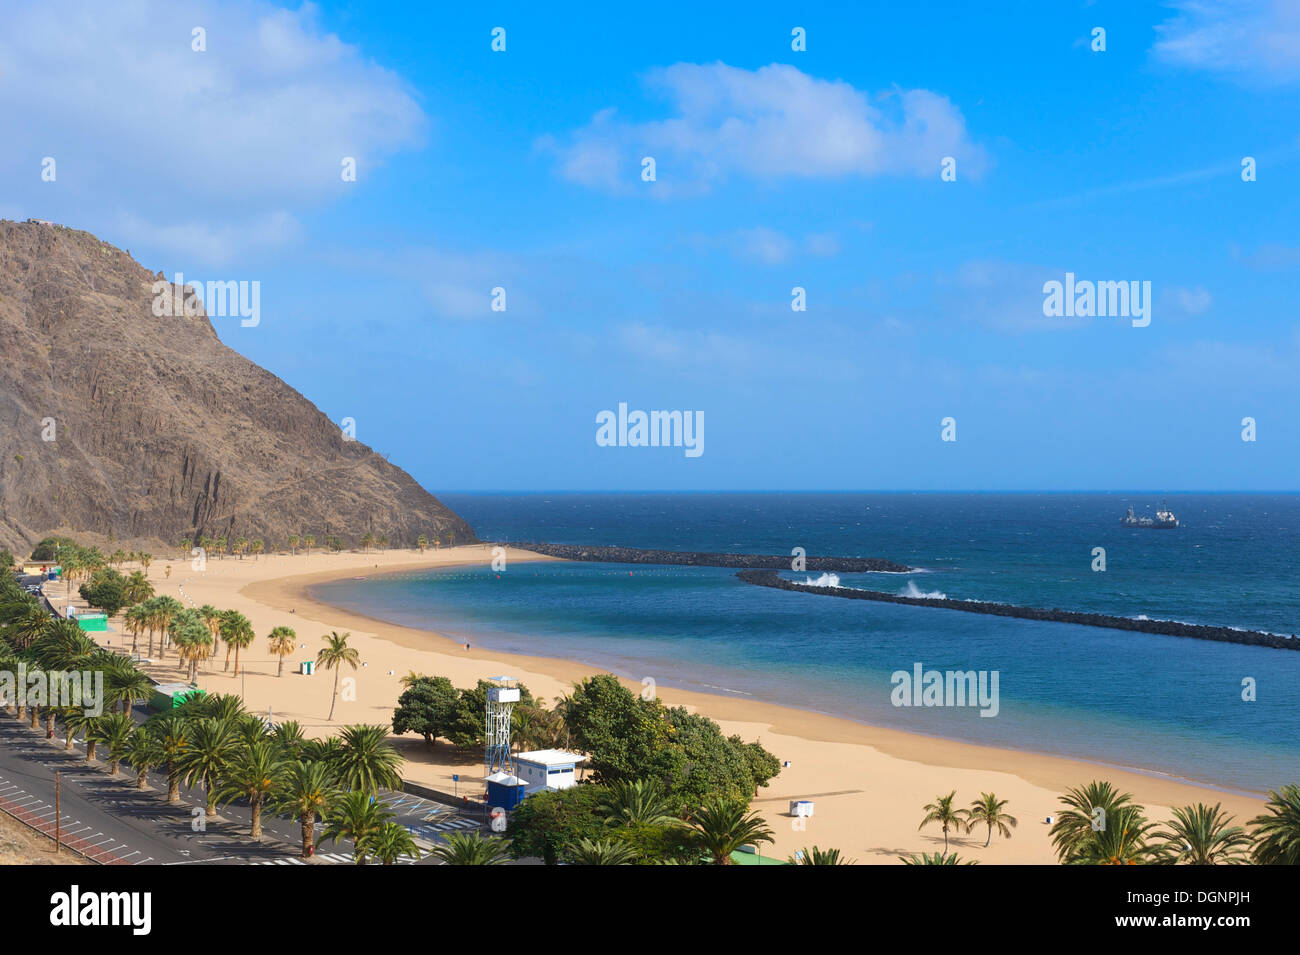 Beach of Playa de Las Teresitas, Tenerife, Canary Islands, Spain - Stock Image